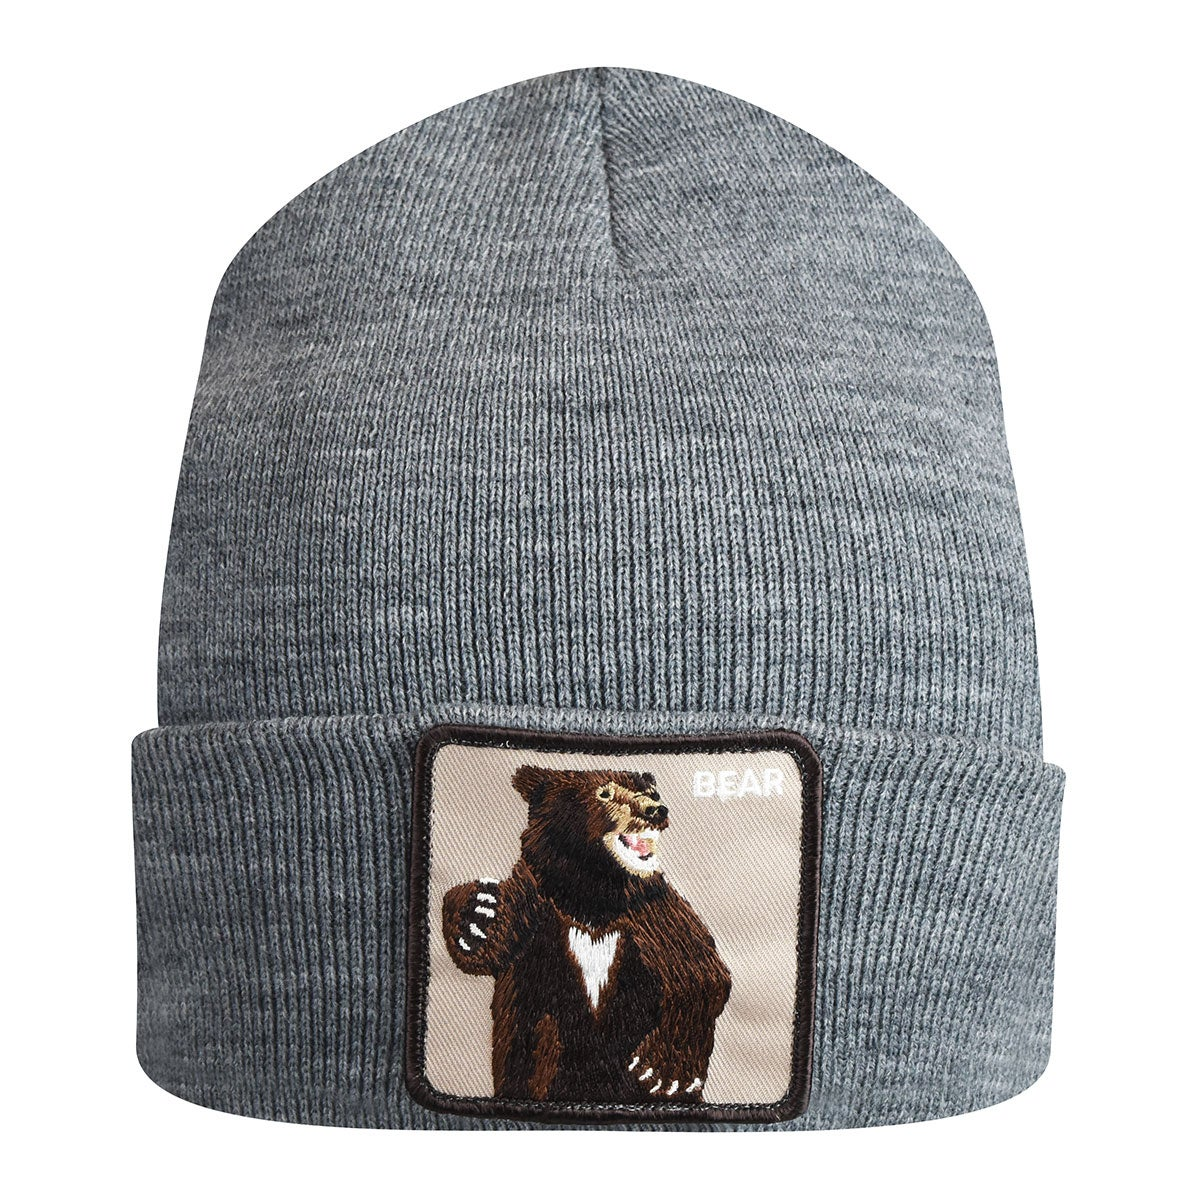 Goorin Bros. Lover Bear Beanie in Grey